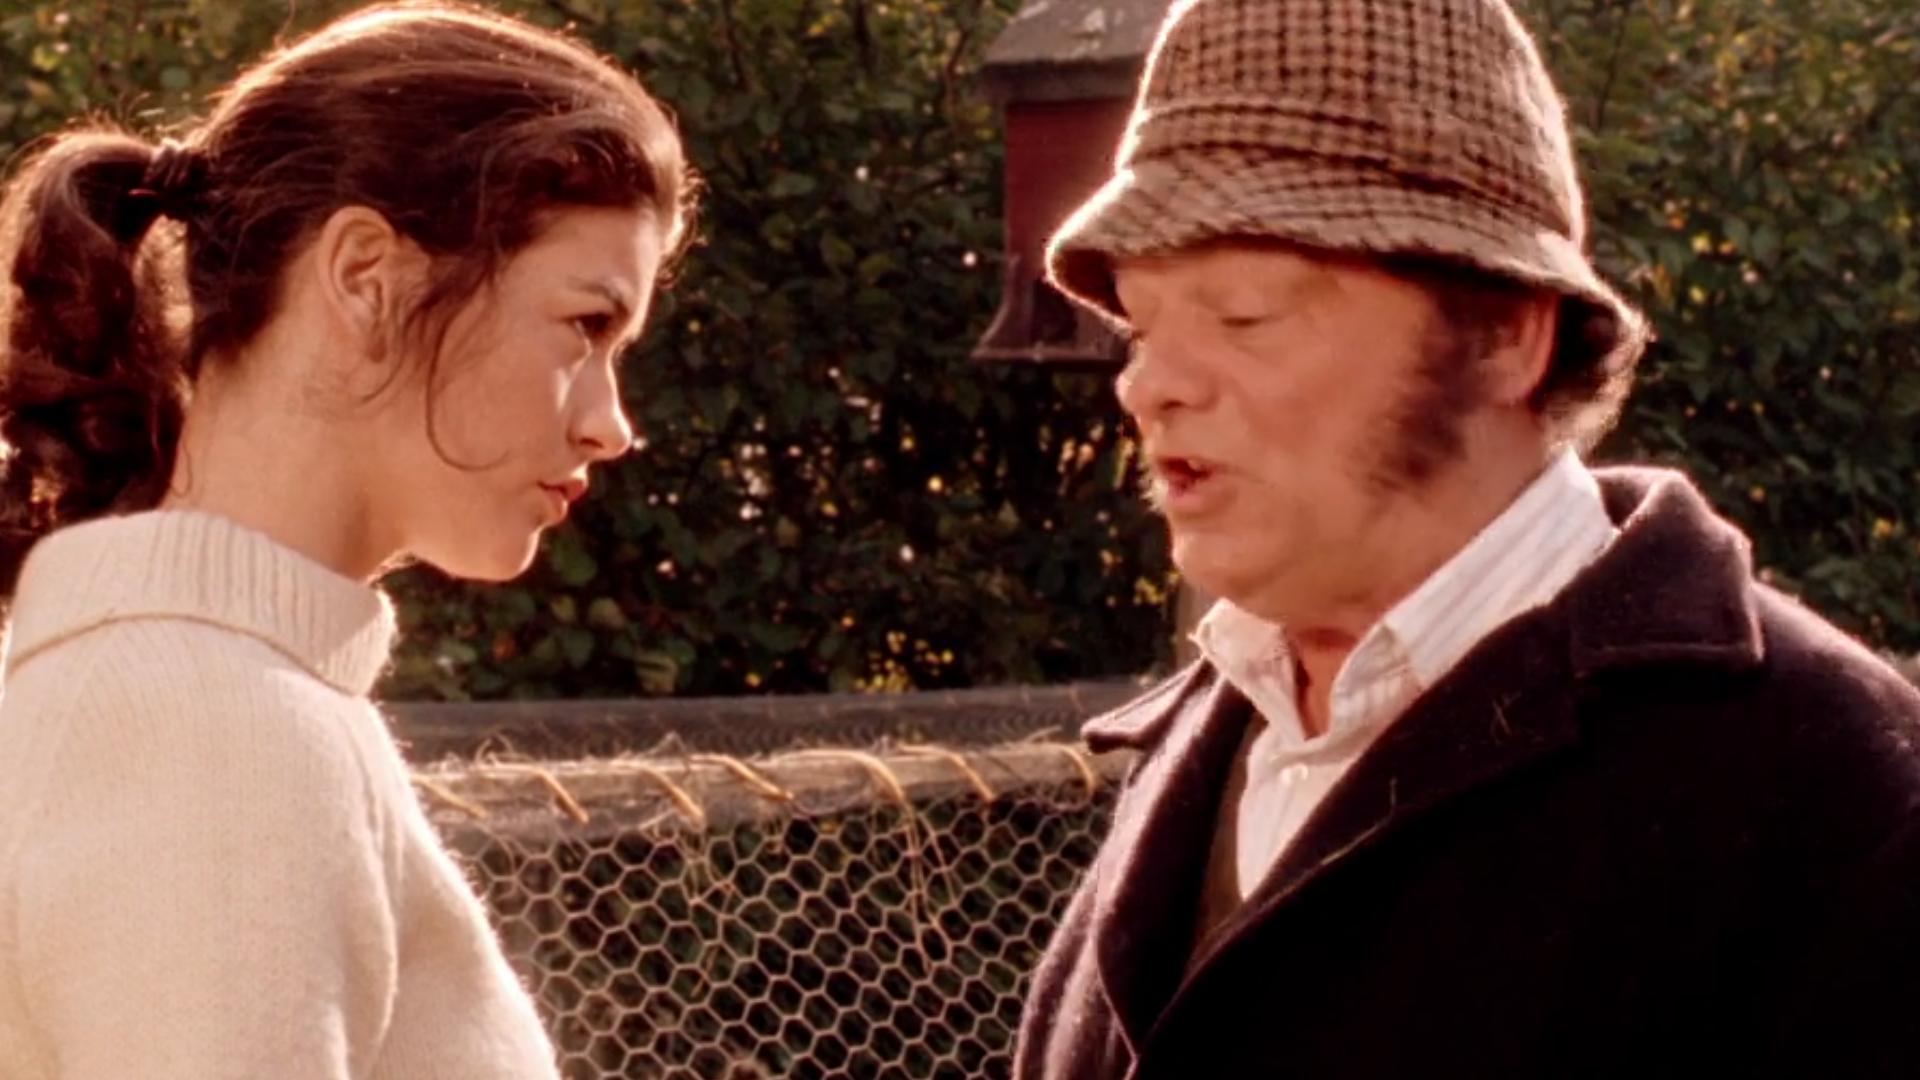 Catherine Zeta-Jones and David Jason in The Darling Buds of May (1991)